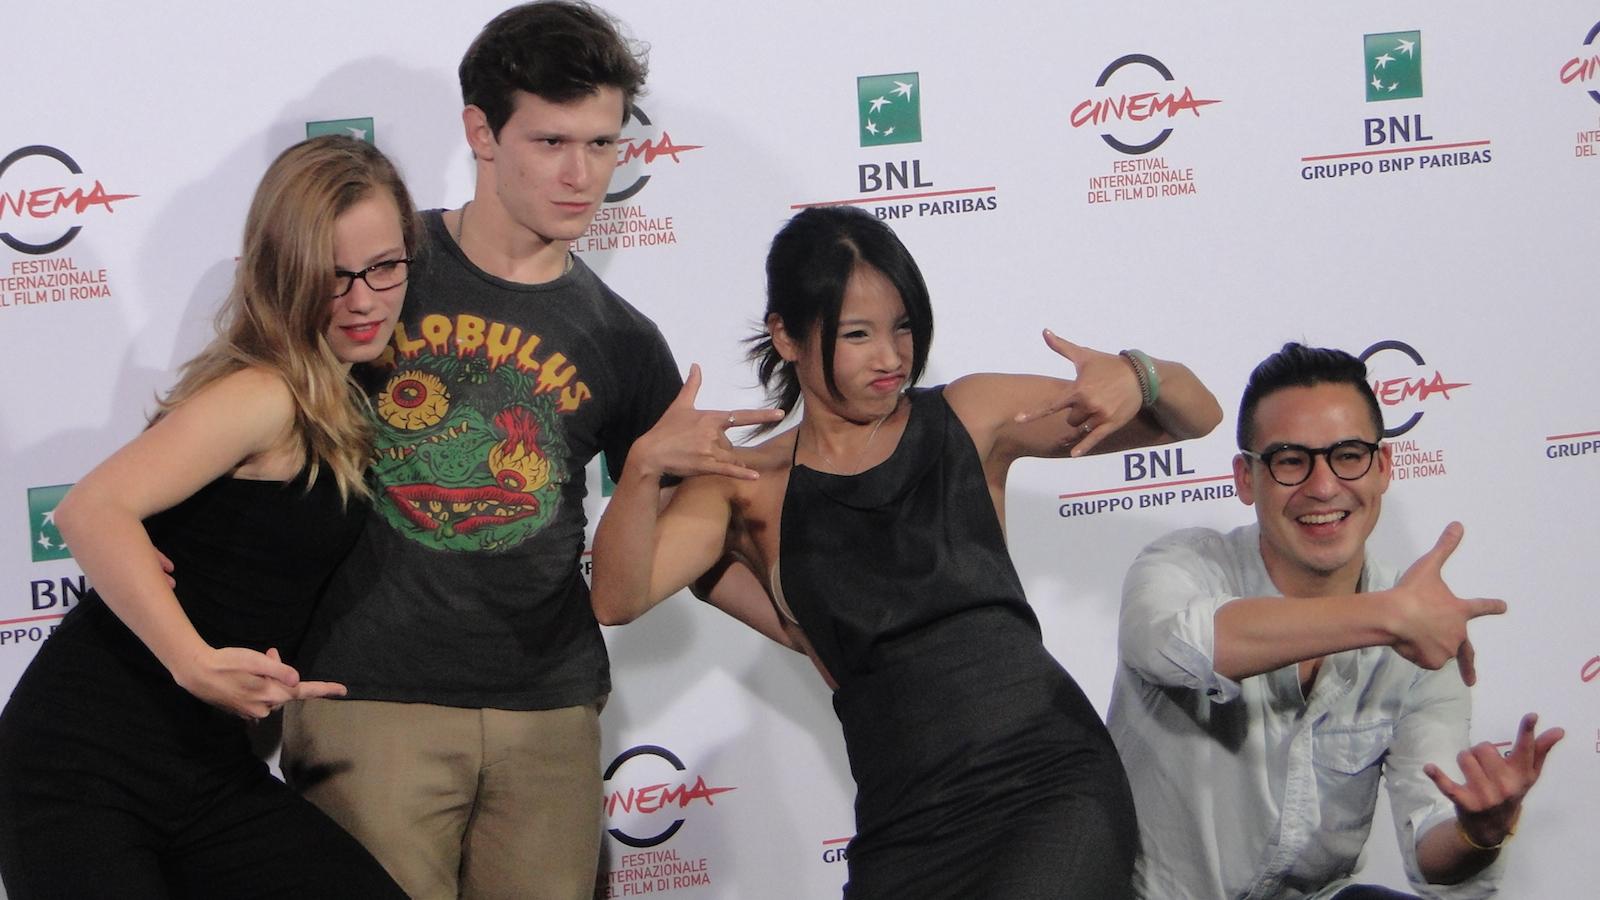 Roma 2014: il cast scherza al photocall di We are Young. We are Strong